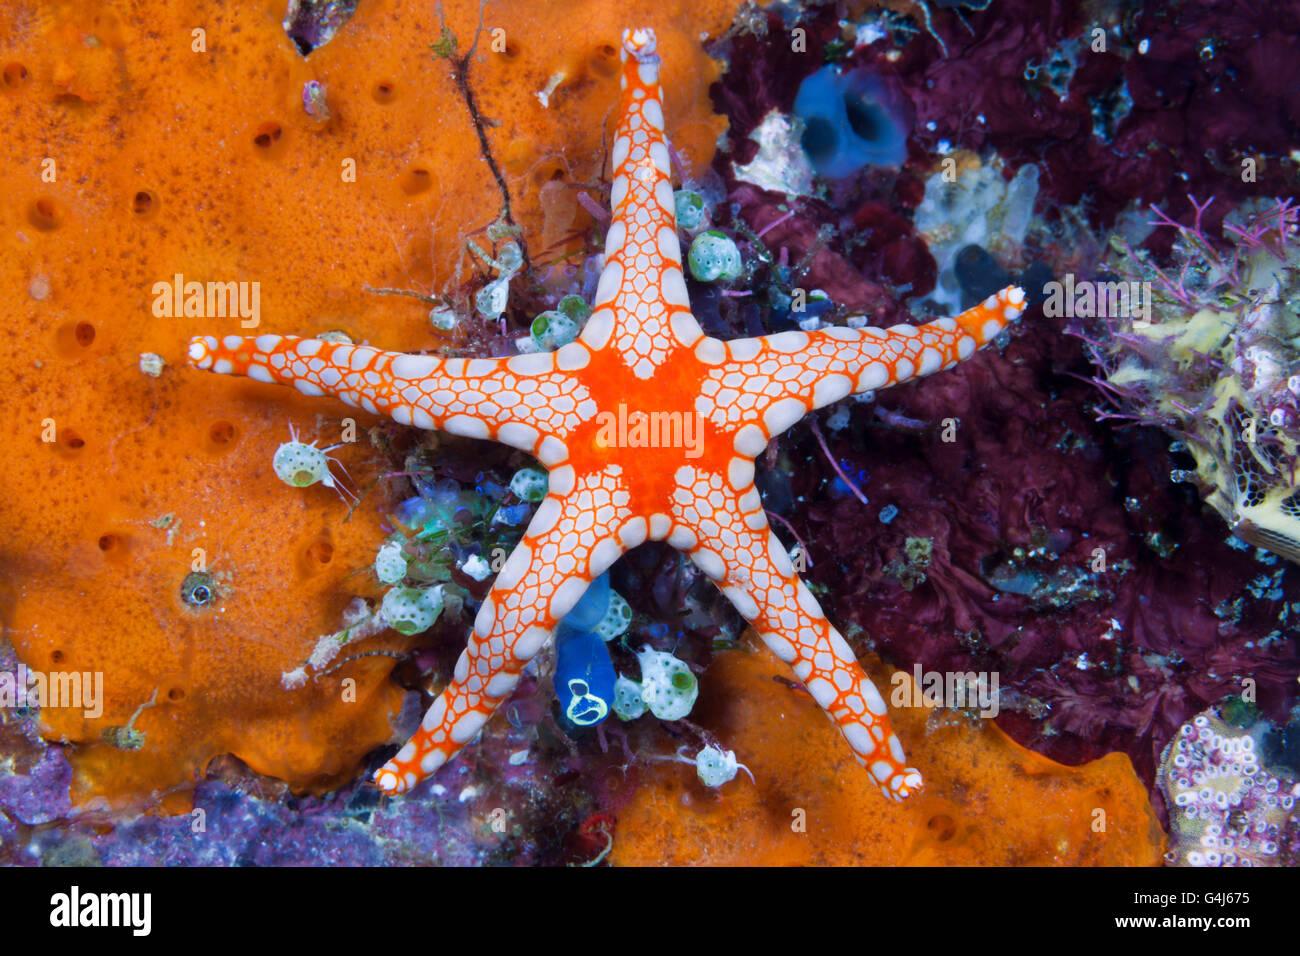 Red Mesh Starfish, Fromia monilis, Ambon, Moluccas, Indonesia - Stock Image